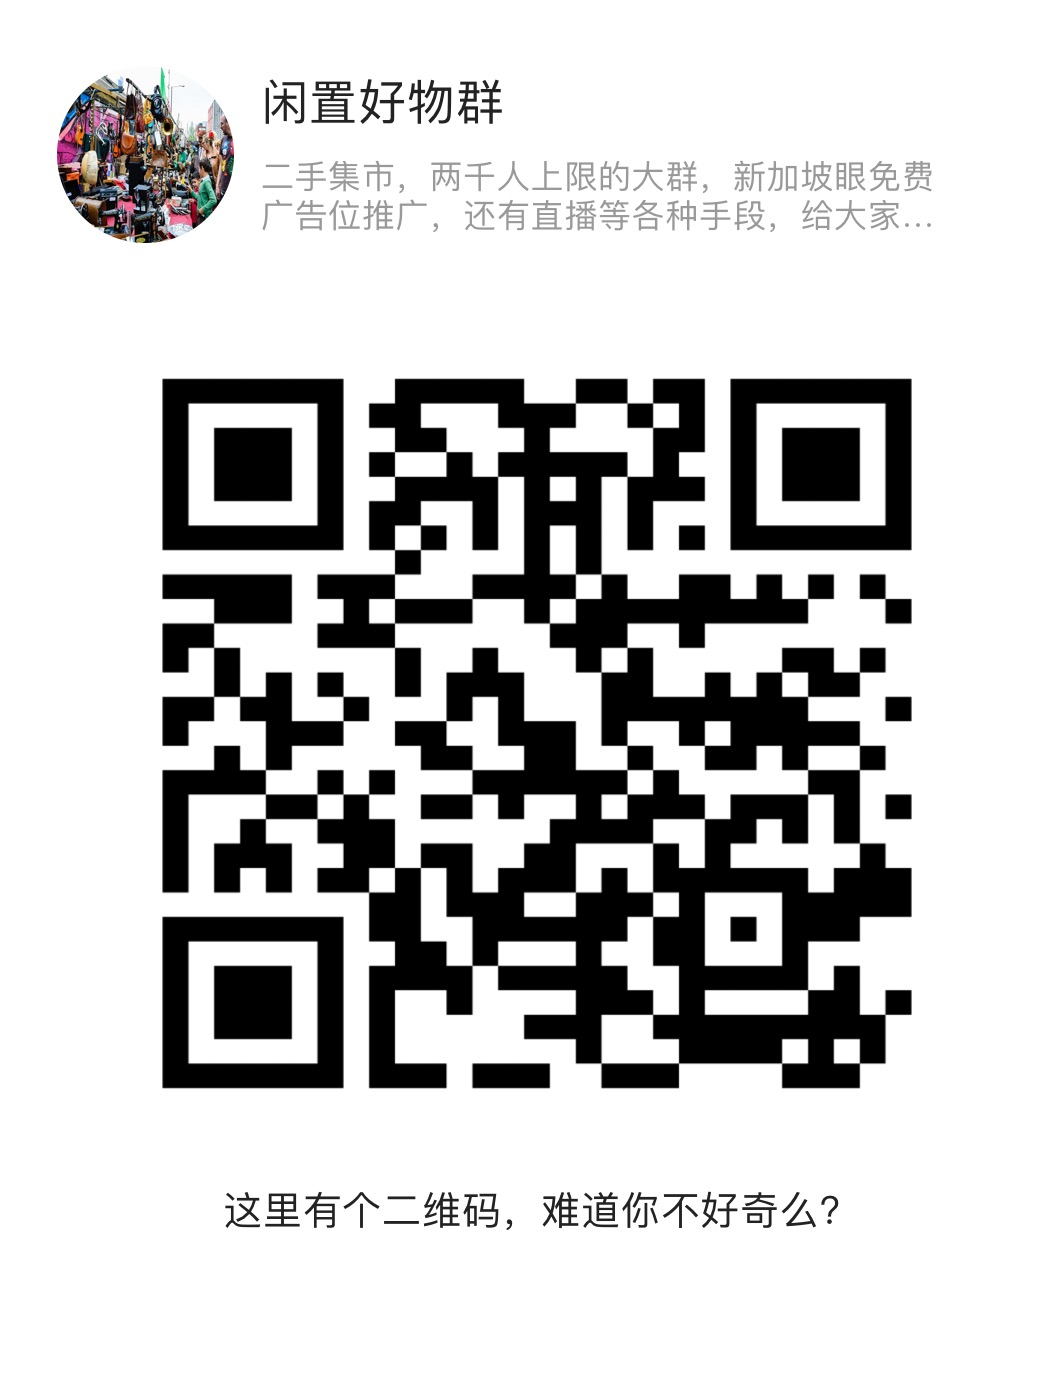 3C0C71B1-EE5B-4372-98FC-0384F8AD86CA.jpeg